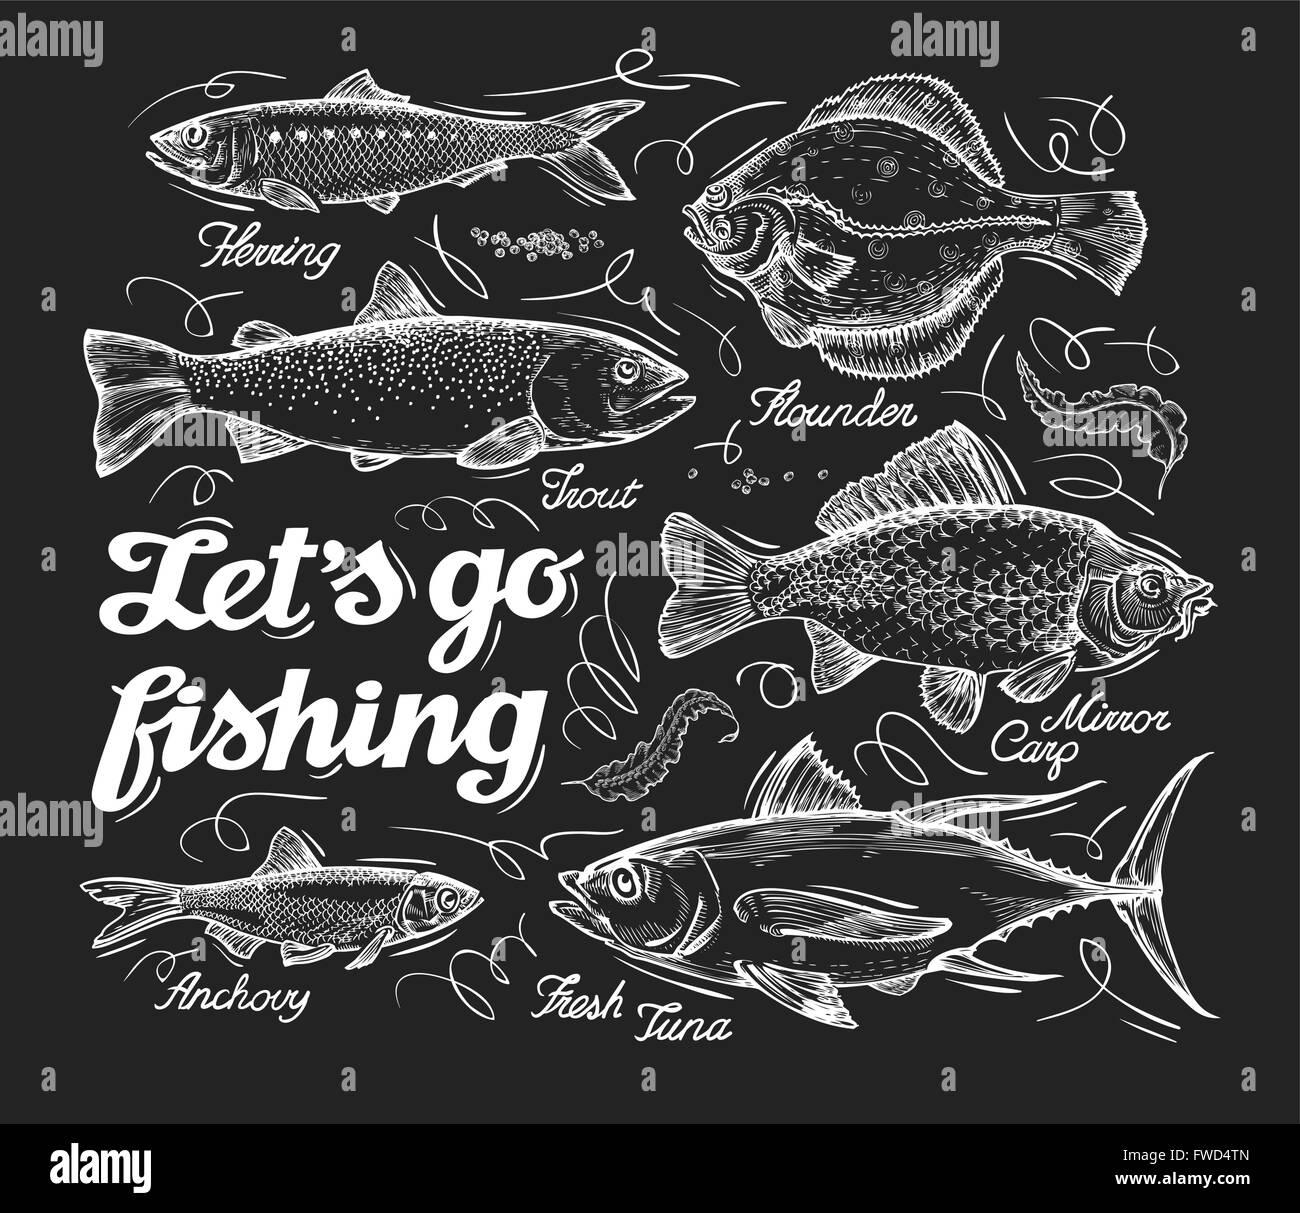 La pesca. Croquis dibujados a mano de pescado, arenque, trucha ...